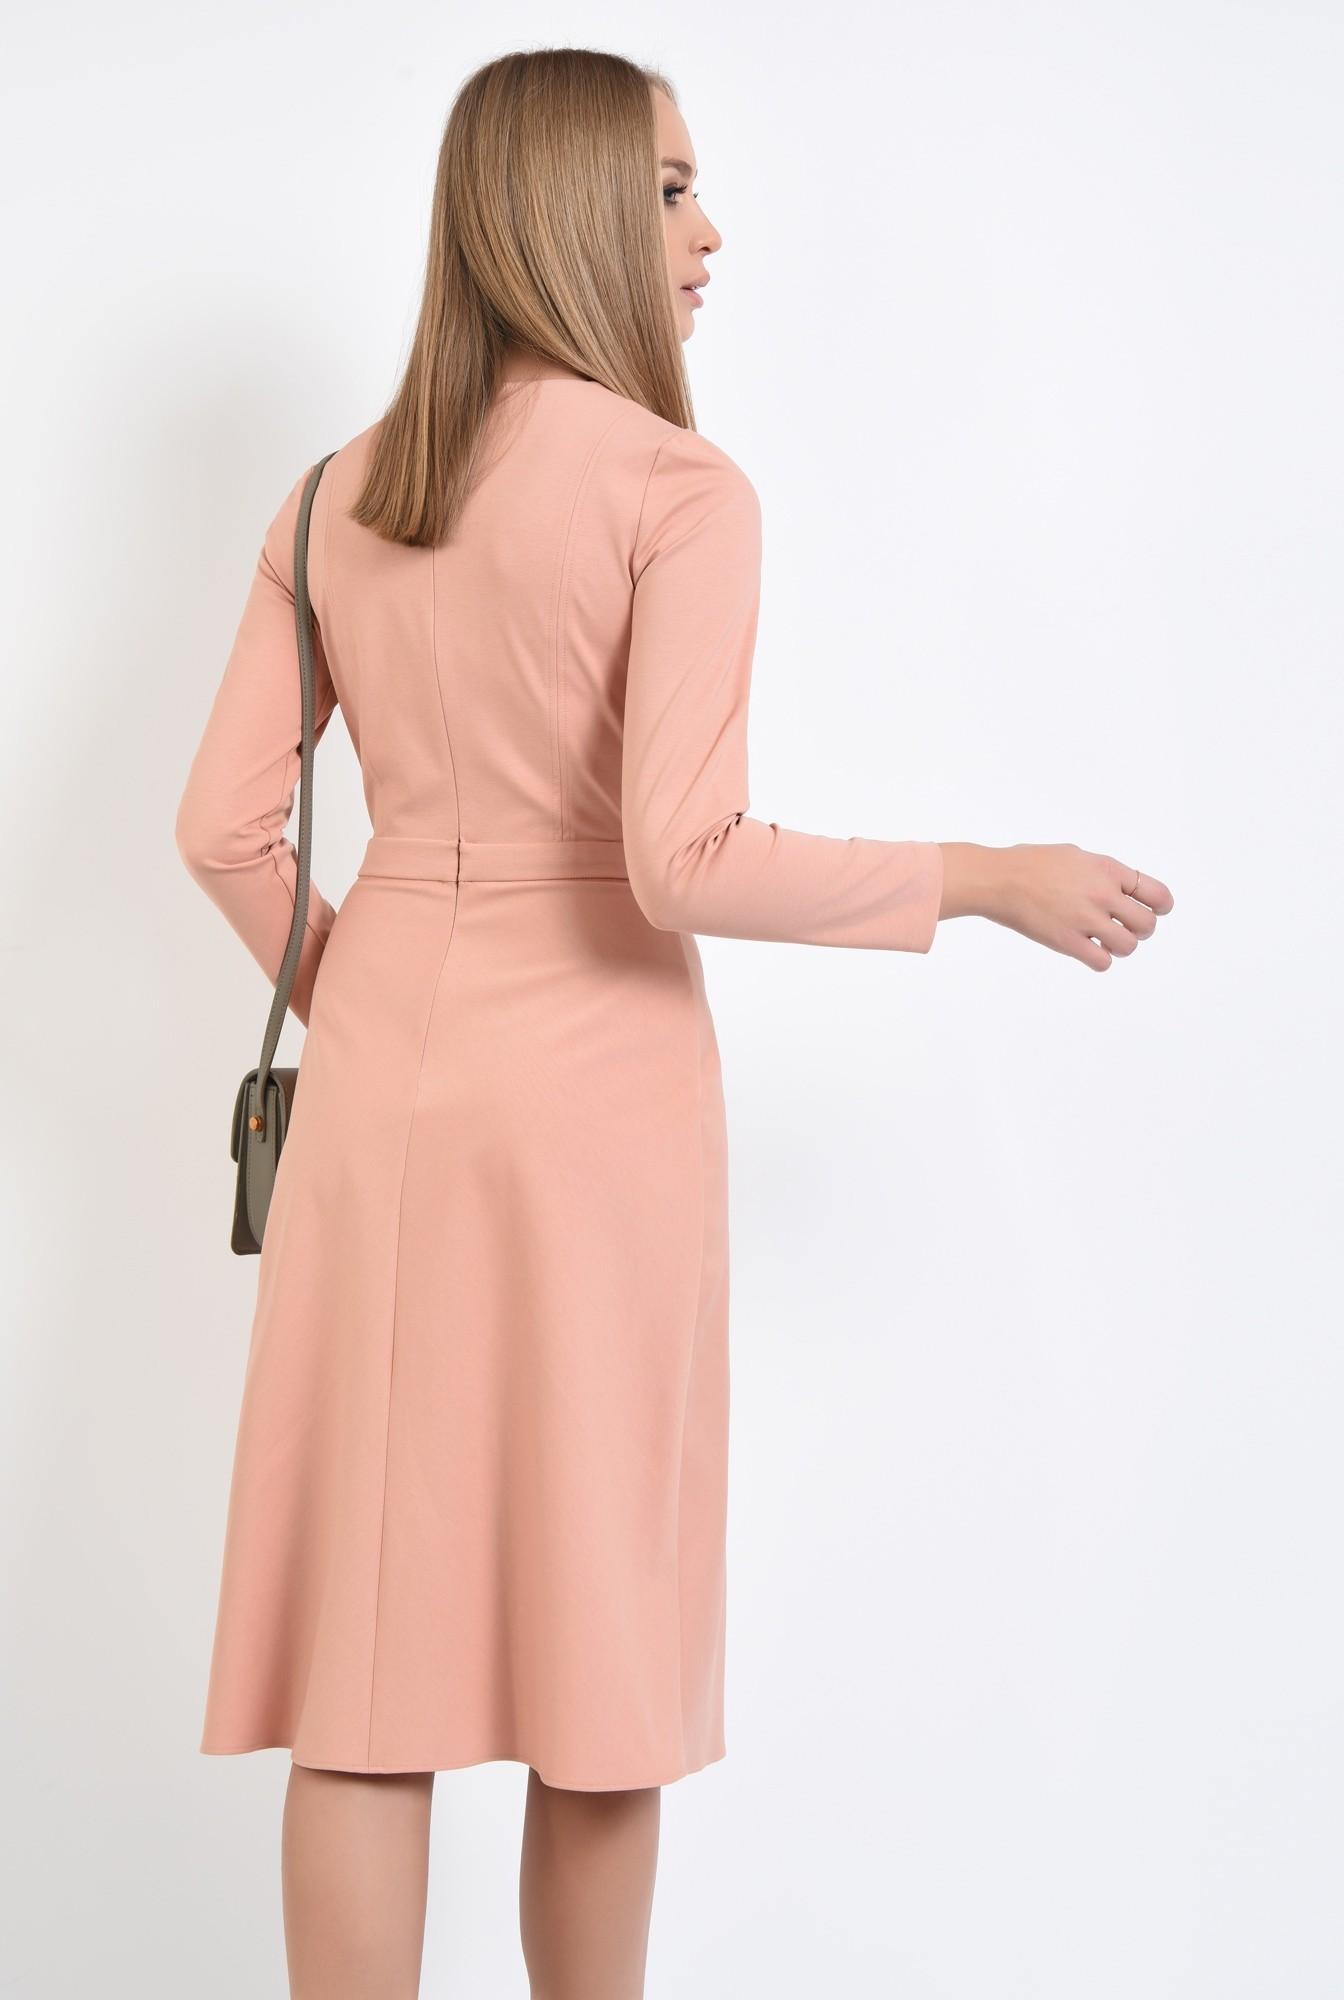 1 - rochie casual, roz piersica, evazata, maneci lungi